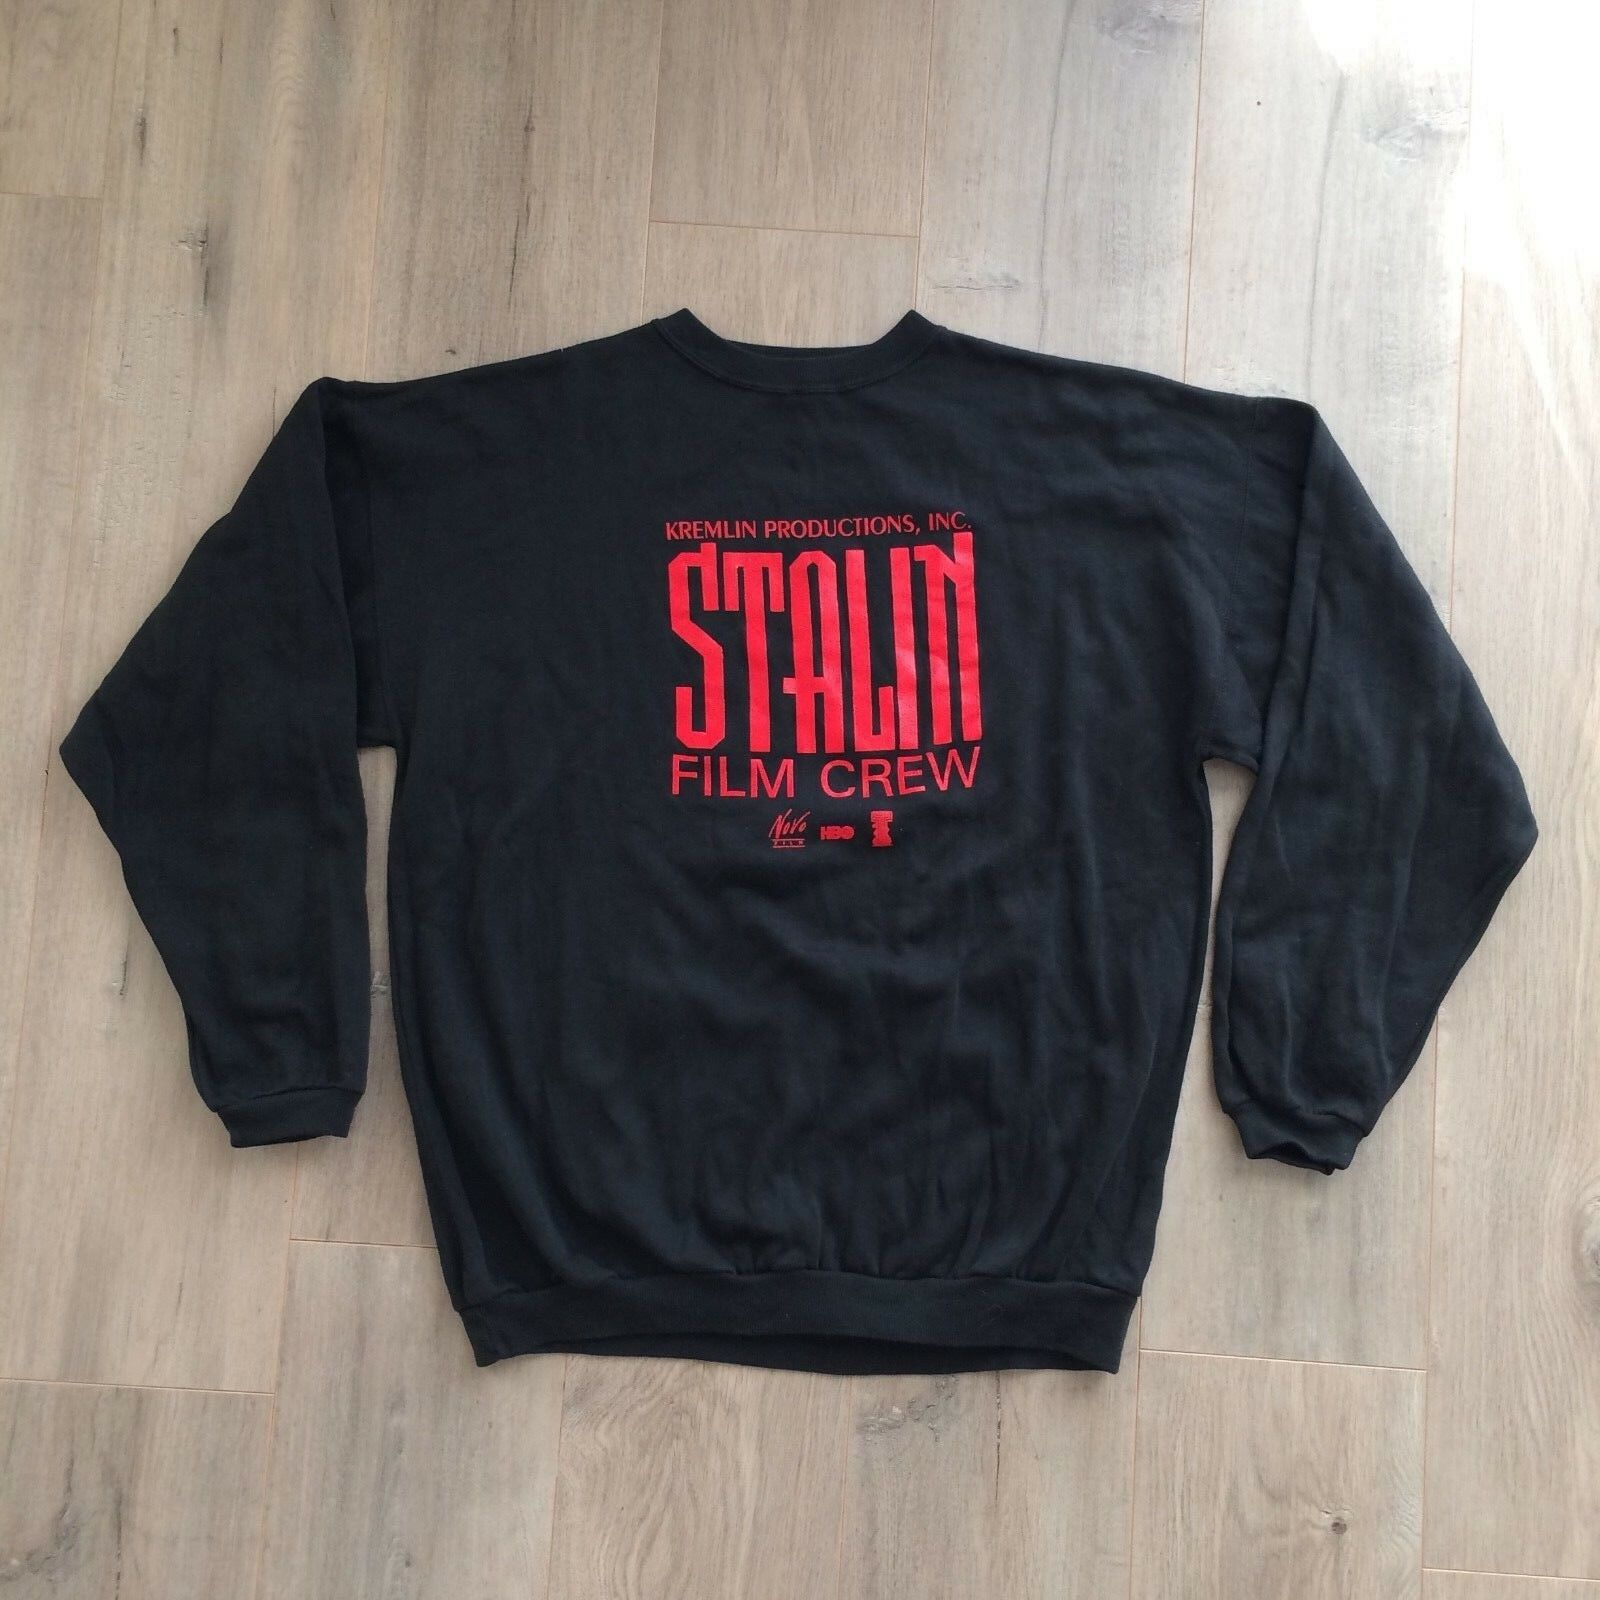 RARE 90s 1991 Vintage Sweatshirt STALIN Movie Film Crew HBO Moscow Men XL/2XL